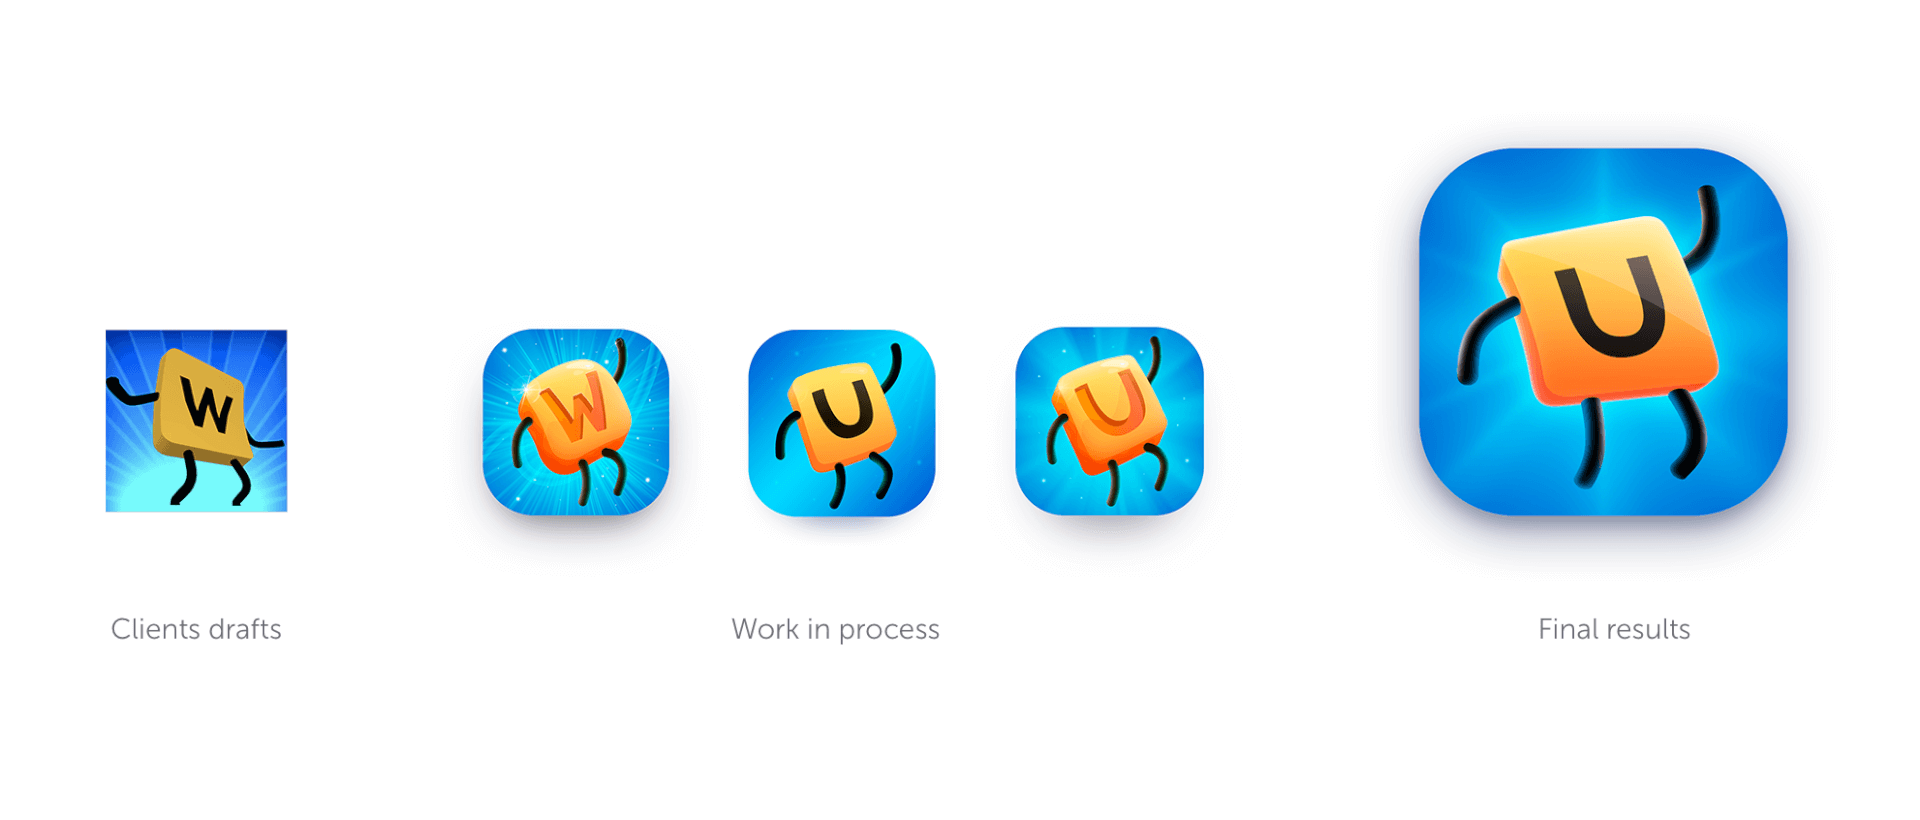 app icon graphic design branding